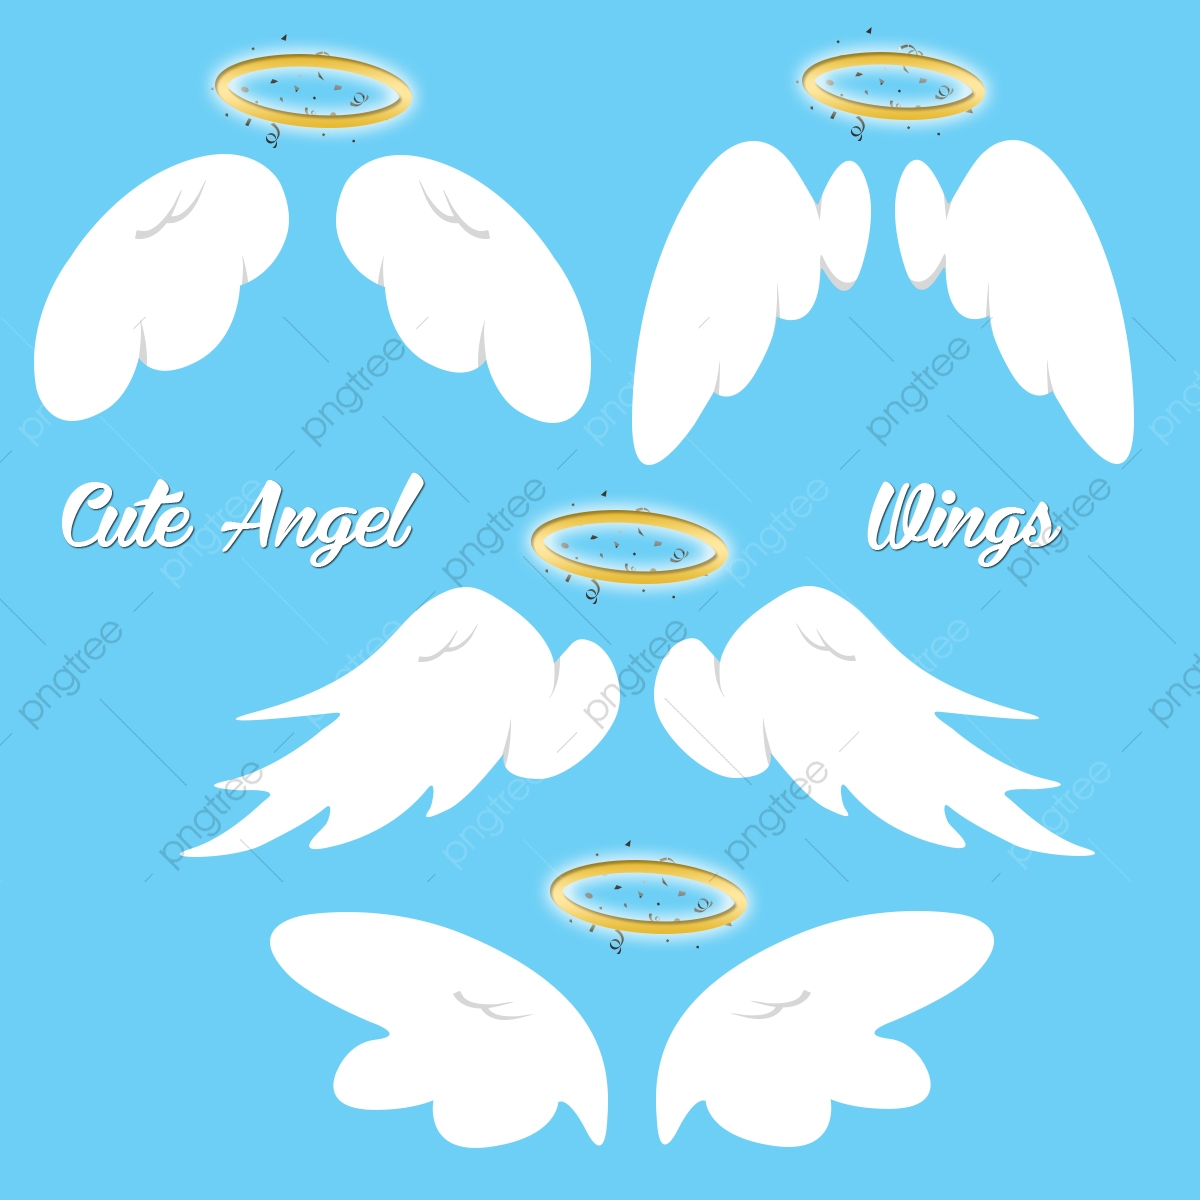 Wing clipart cute. Angel wings set vector